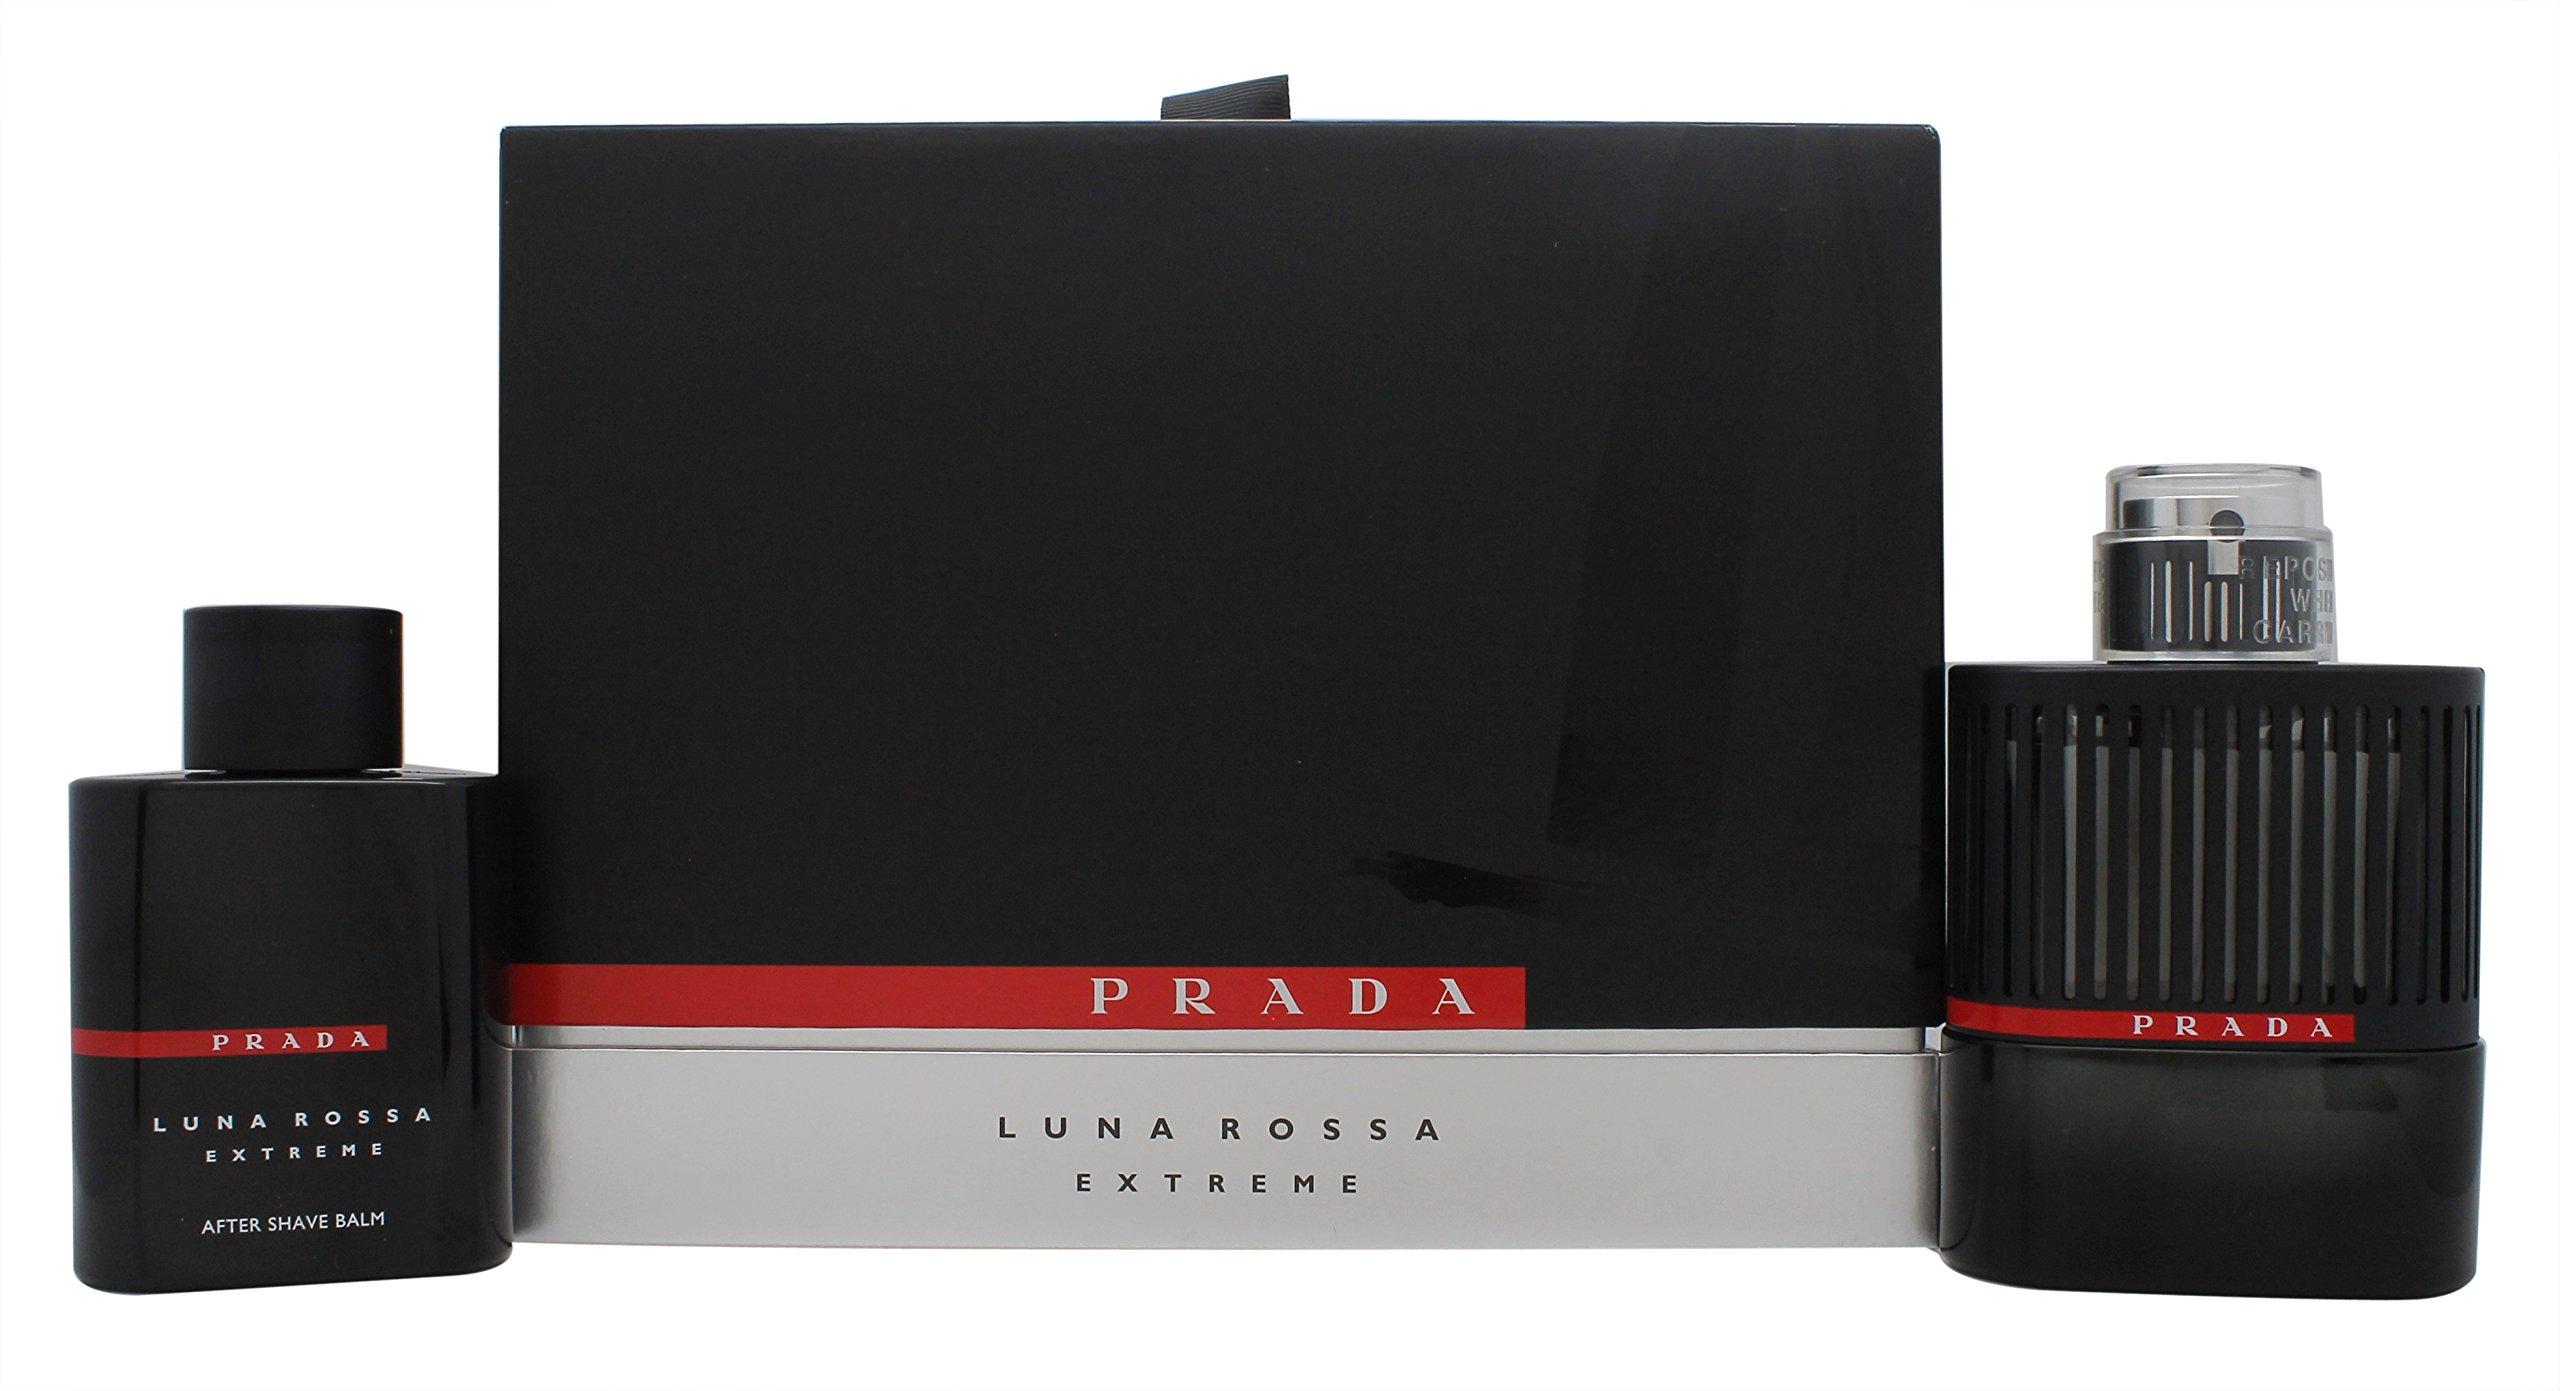 Prada Luna Rossa Extreme Pour Homme 2 Piece Set Includes: 3.4 oz Eau de Parfum Spray + 3.4 oz After Shave Balm